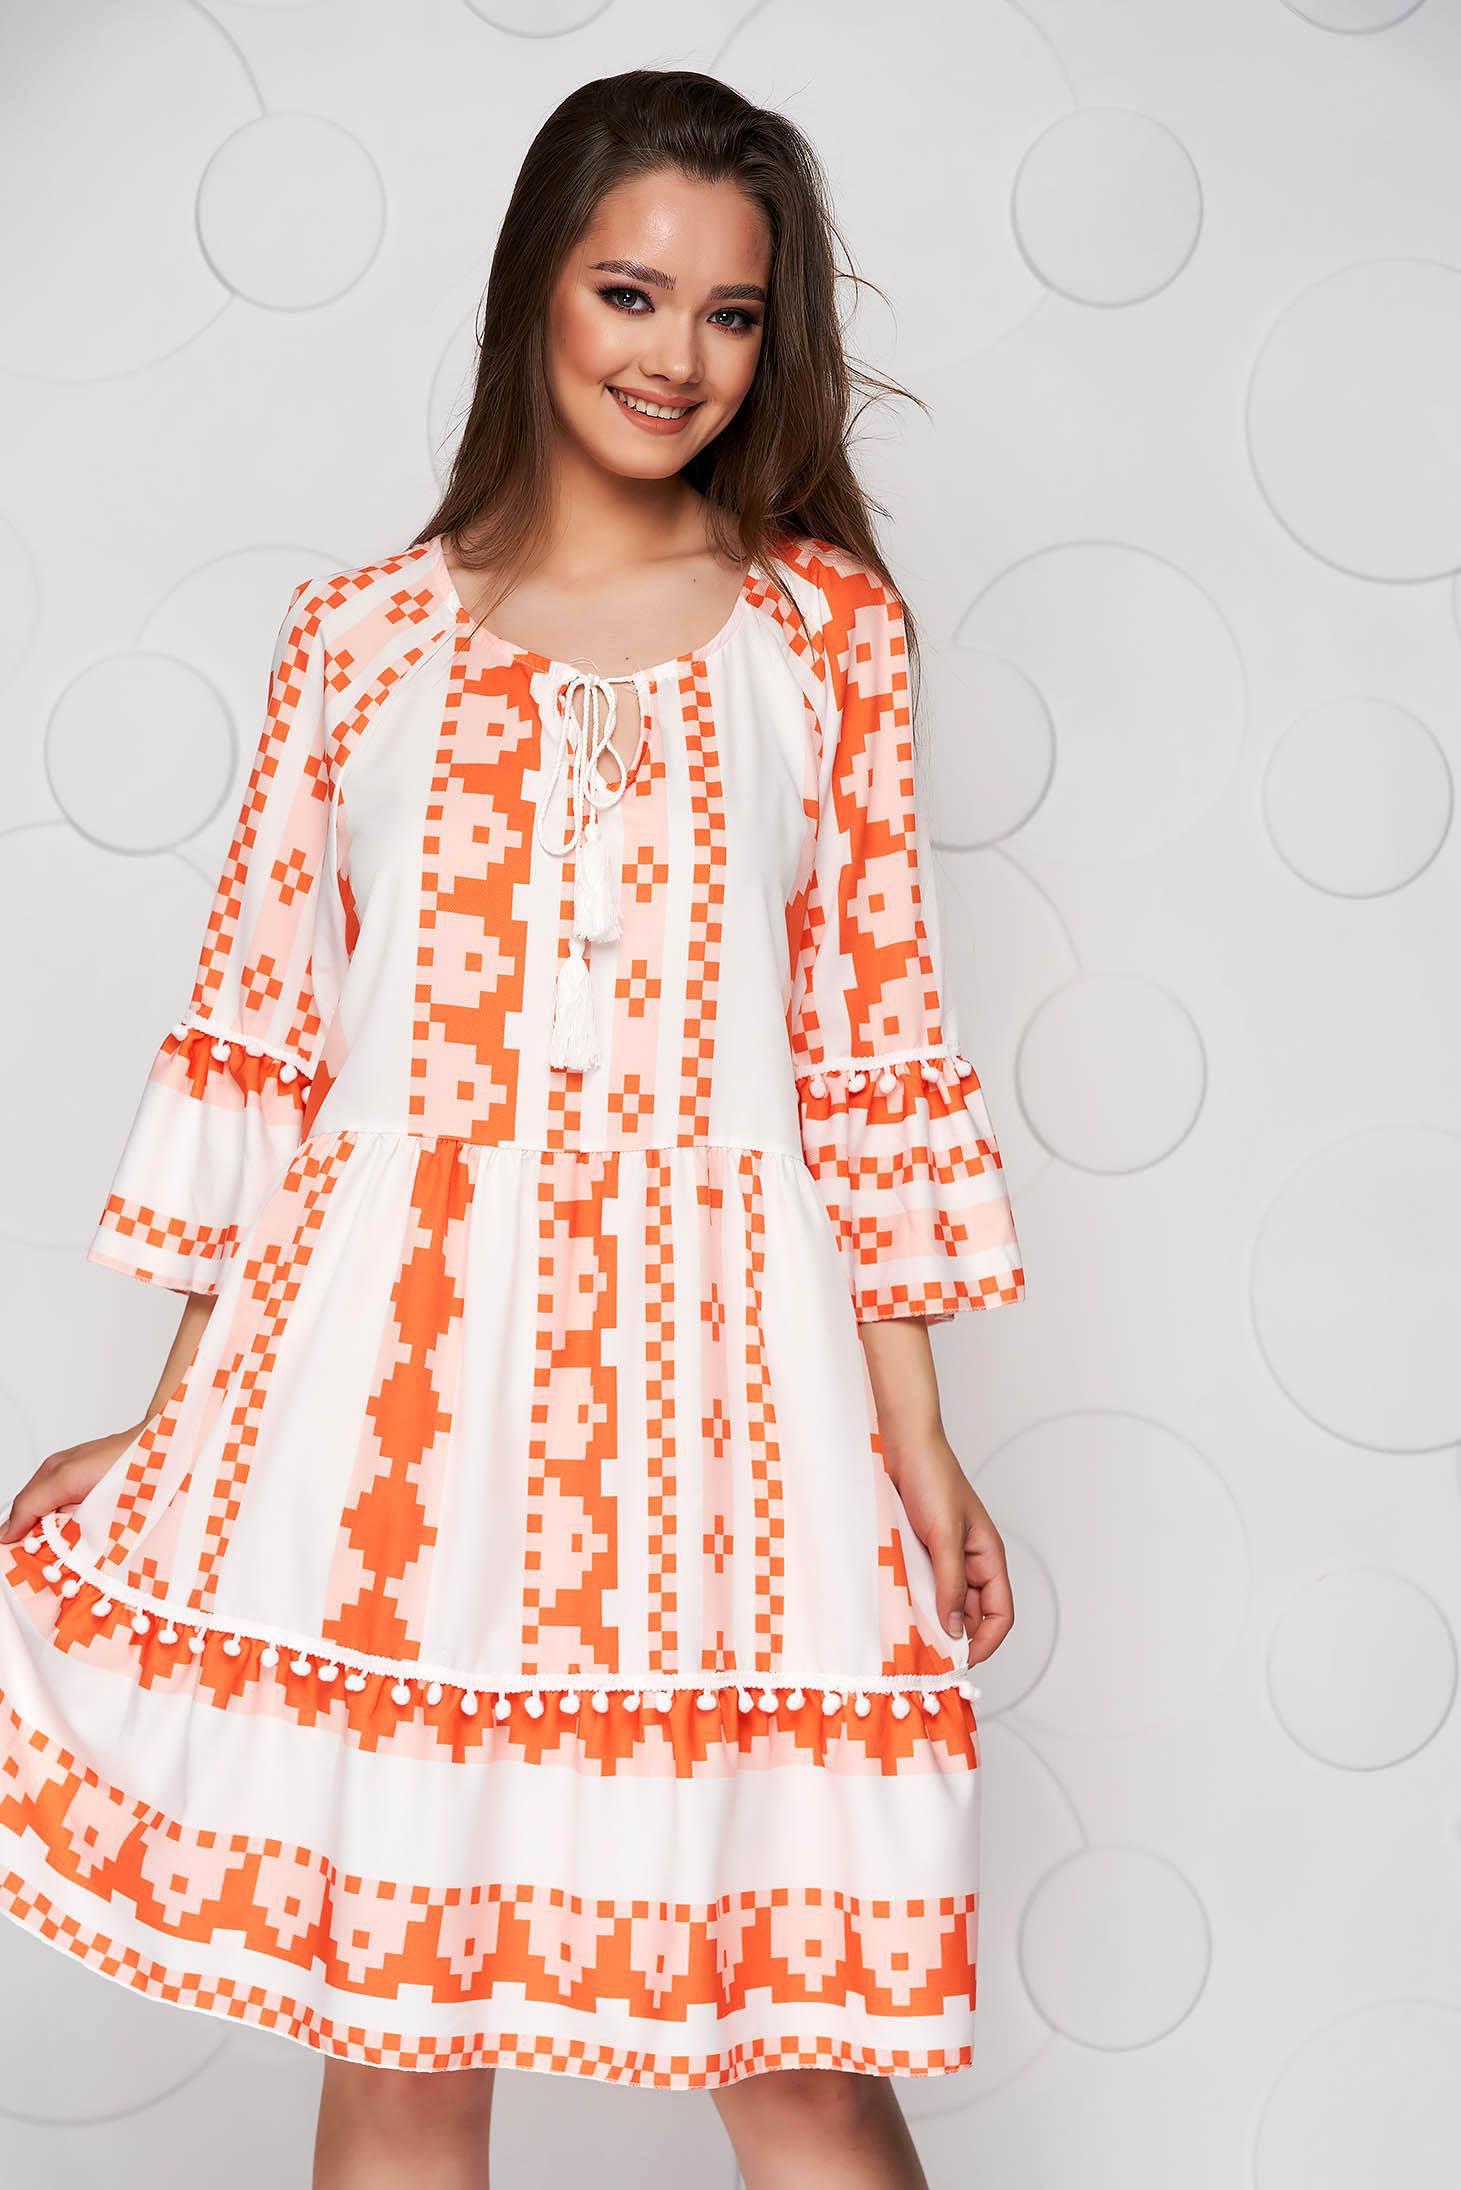 Rochie SunShine portocalie midi cu croi larg din material vaporos cu maneci clopot